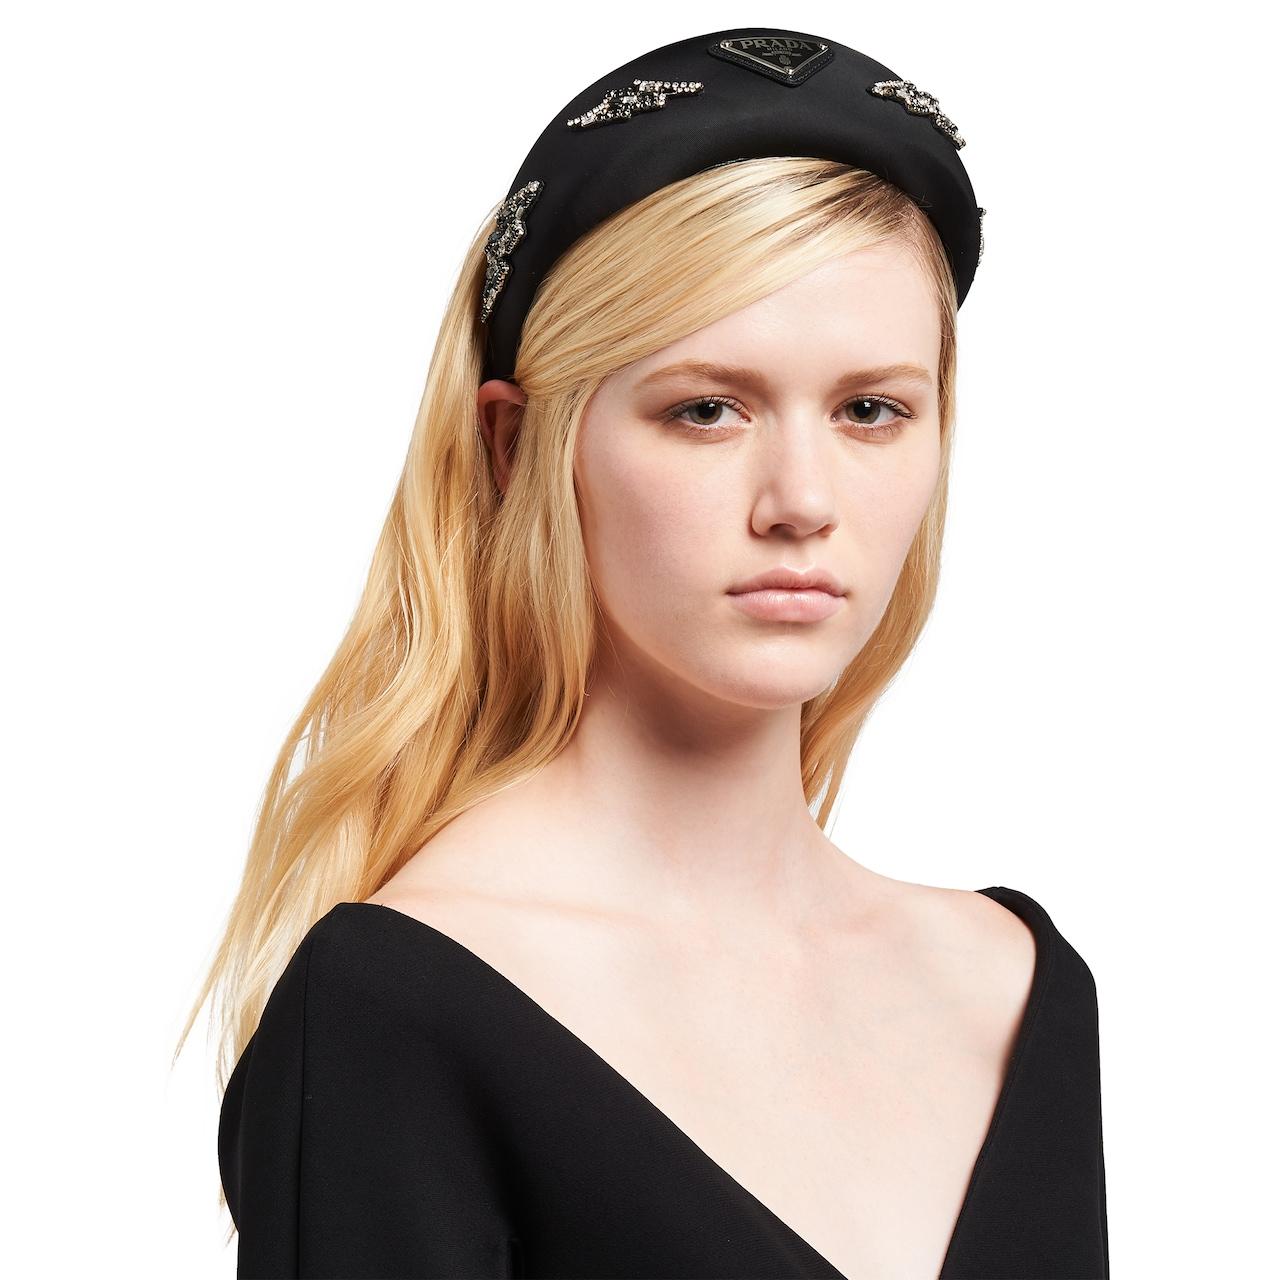 Prada Nylon headband with appliqués 2